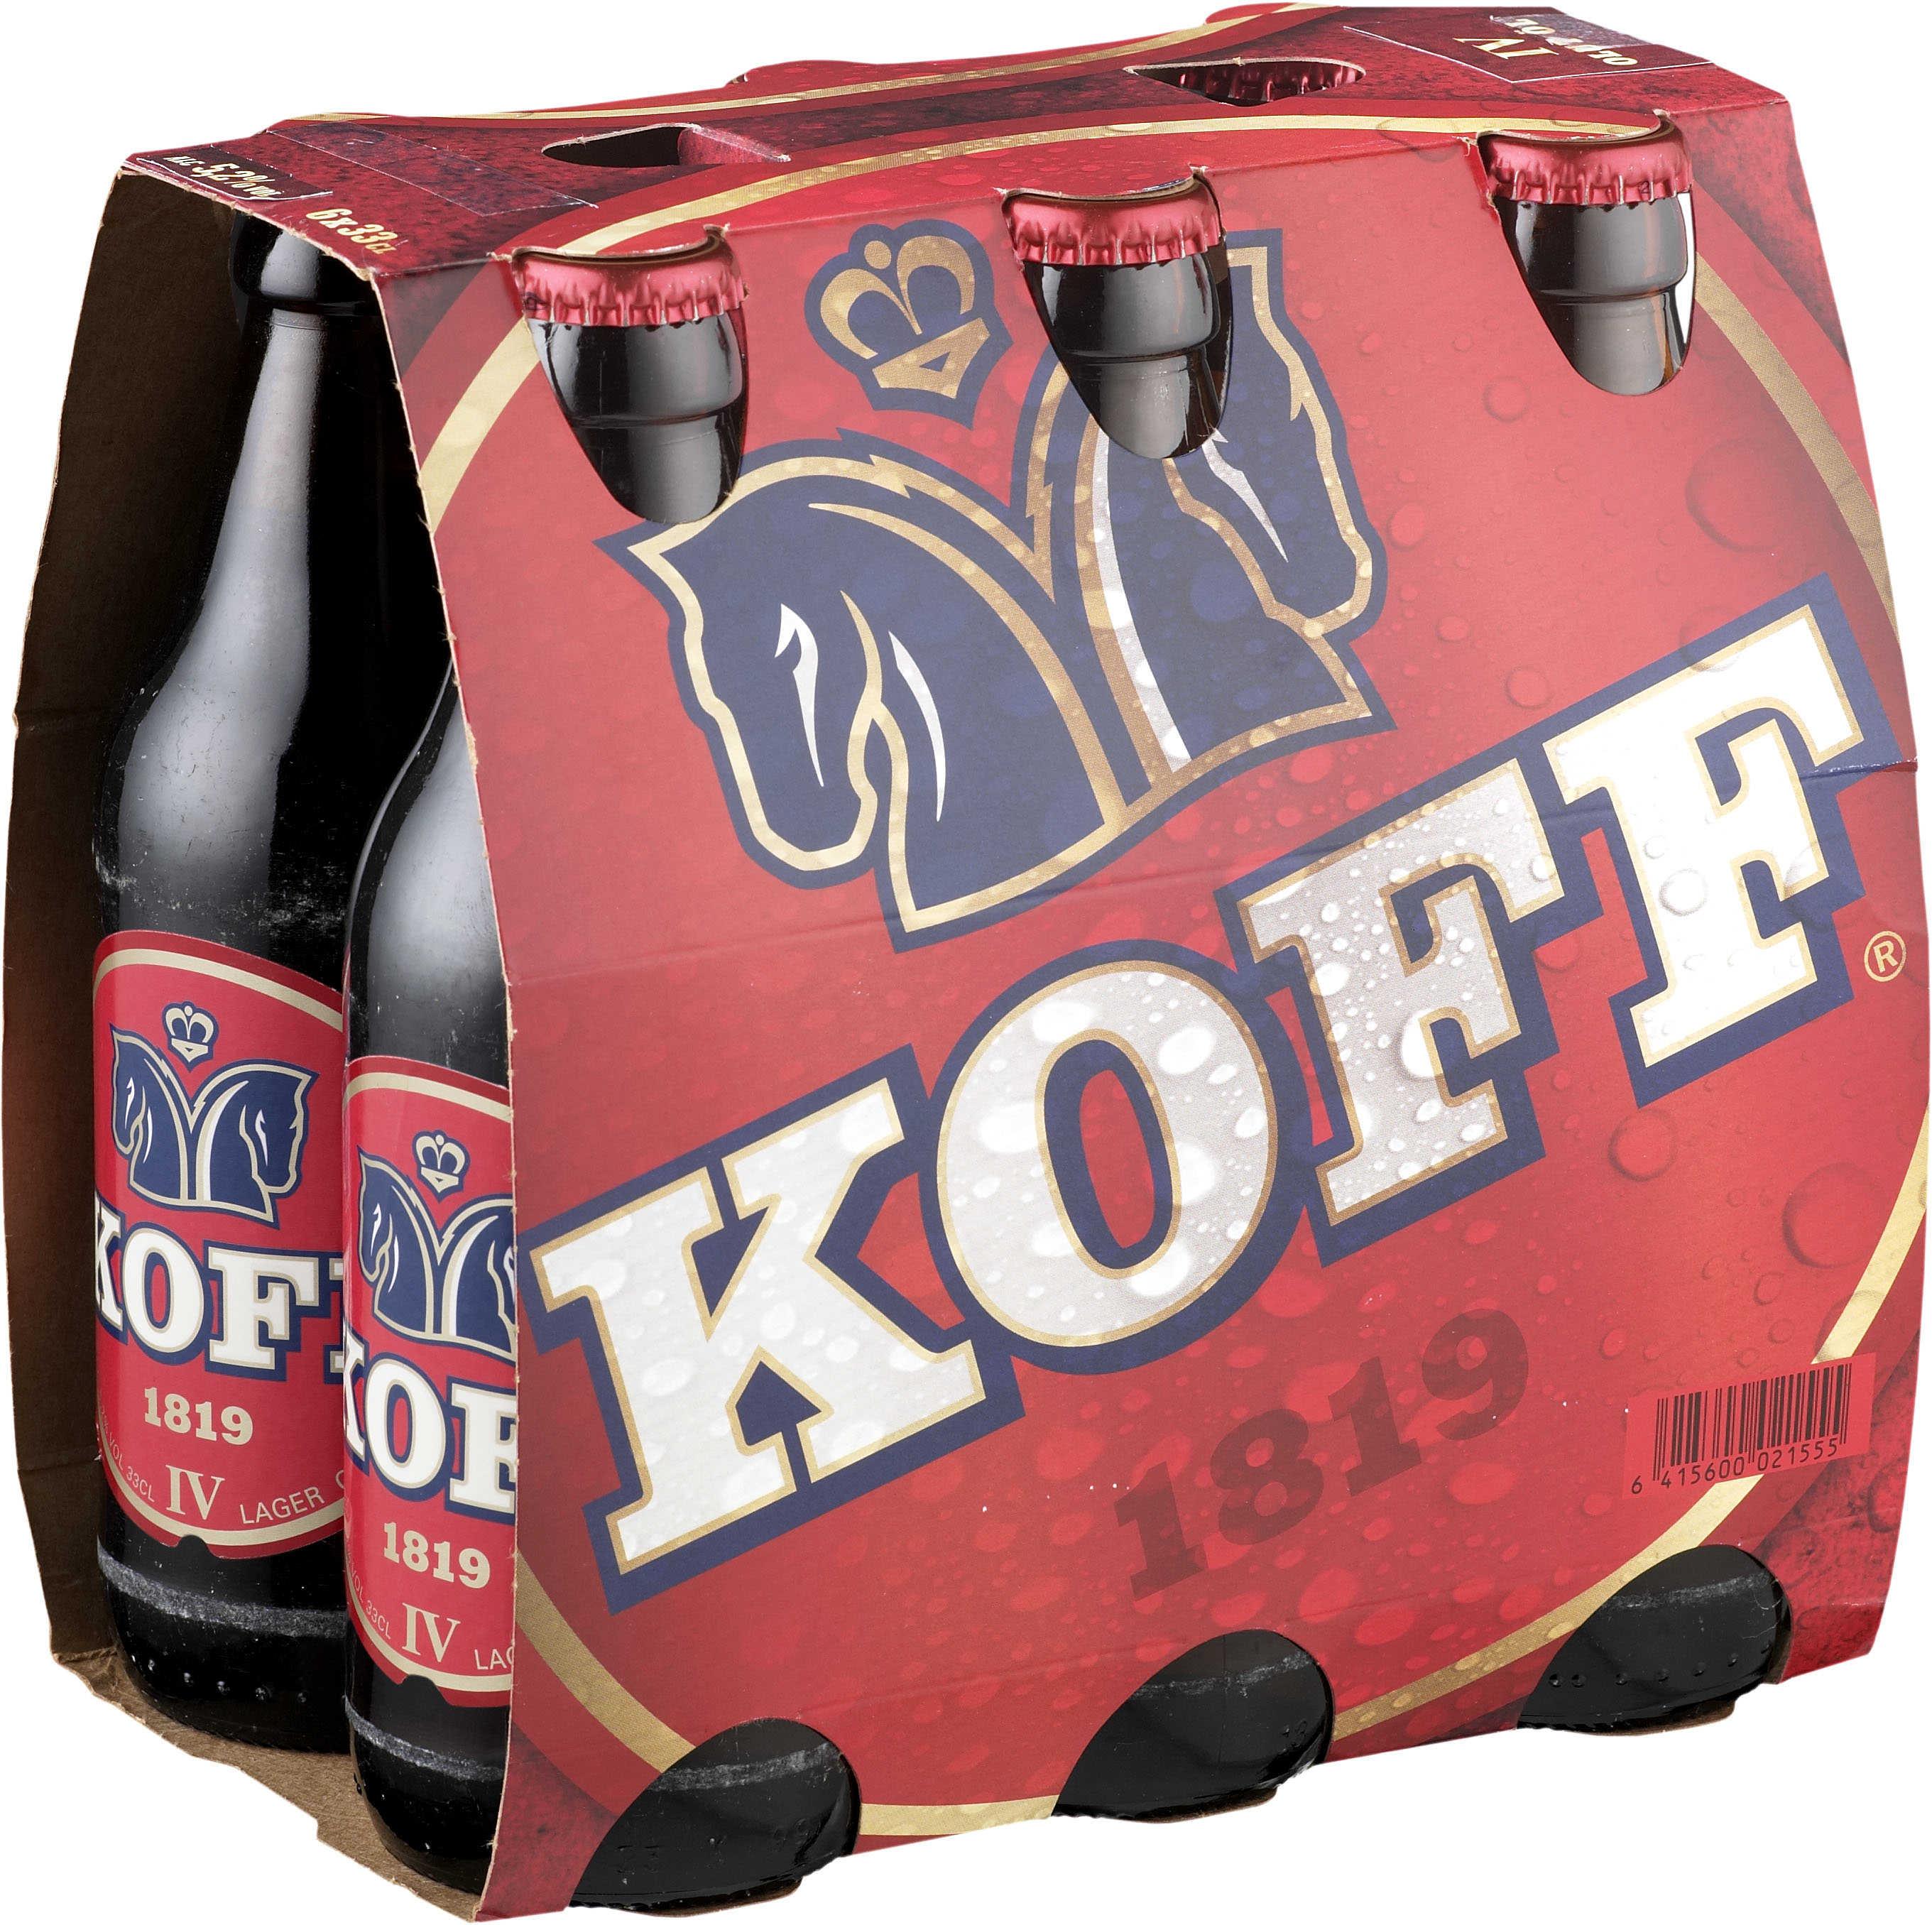 Koff 24 Pack